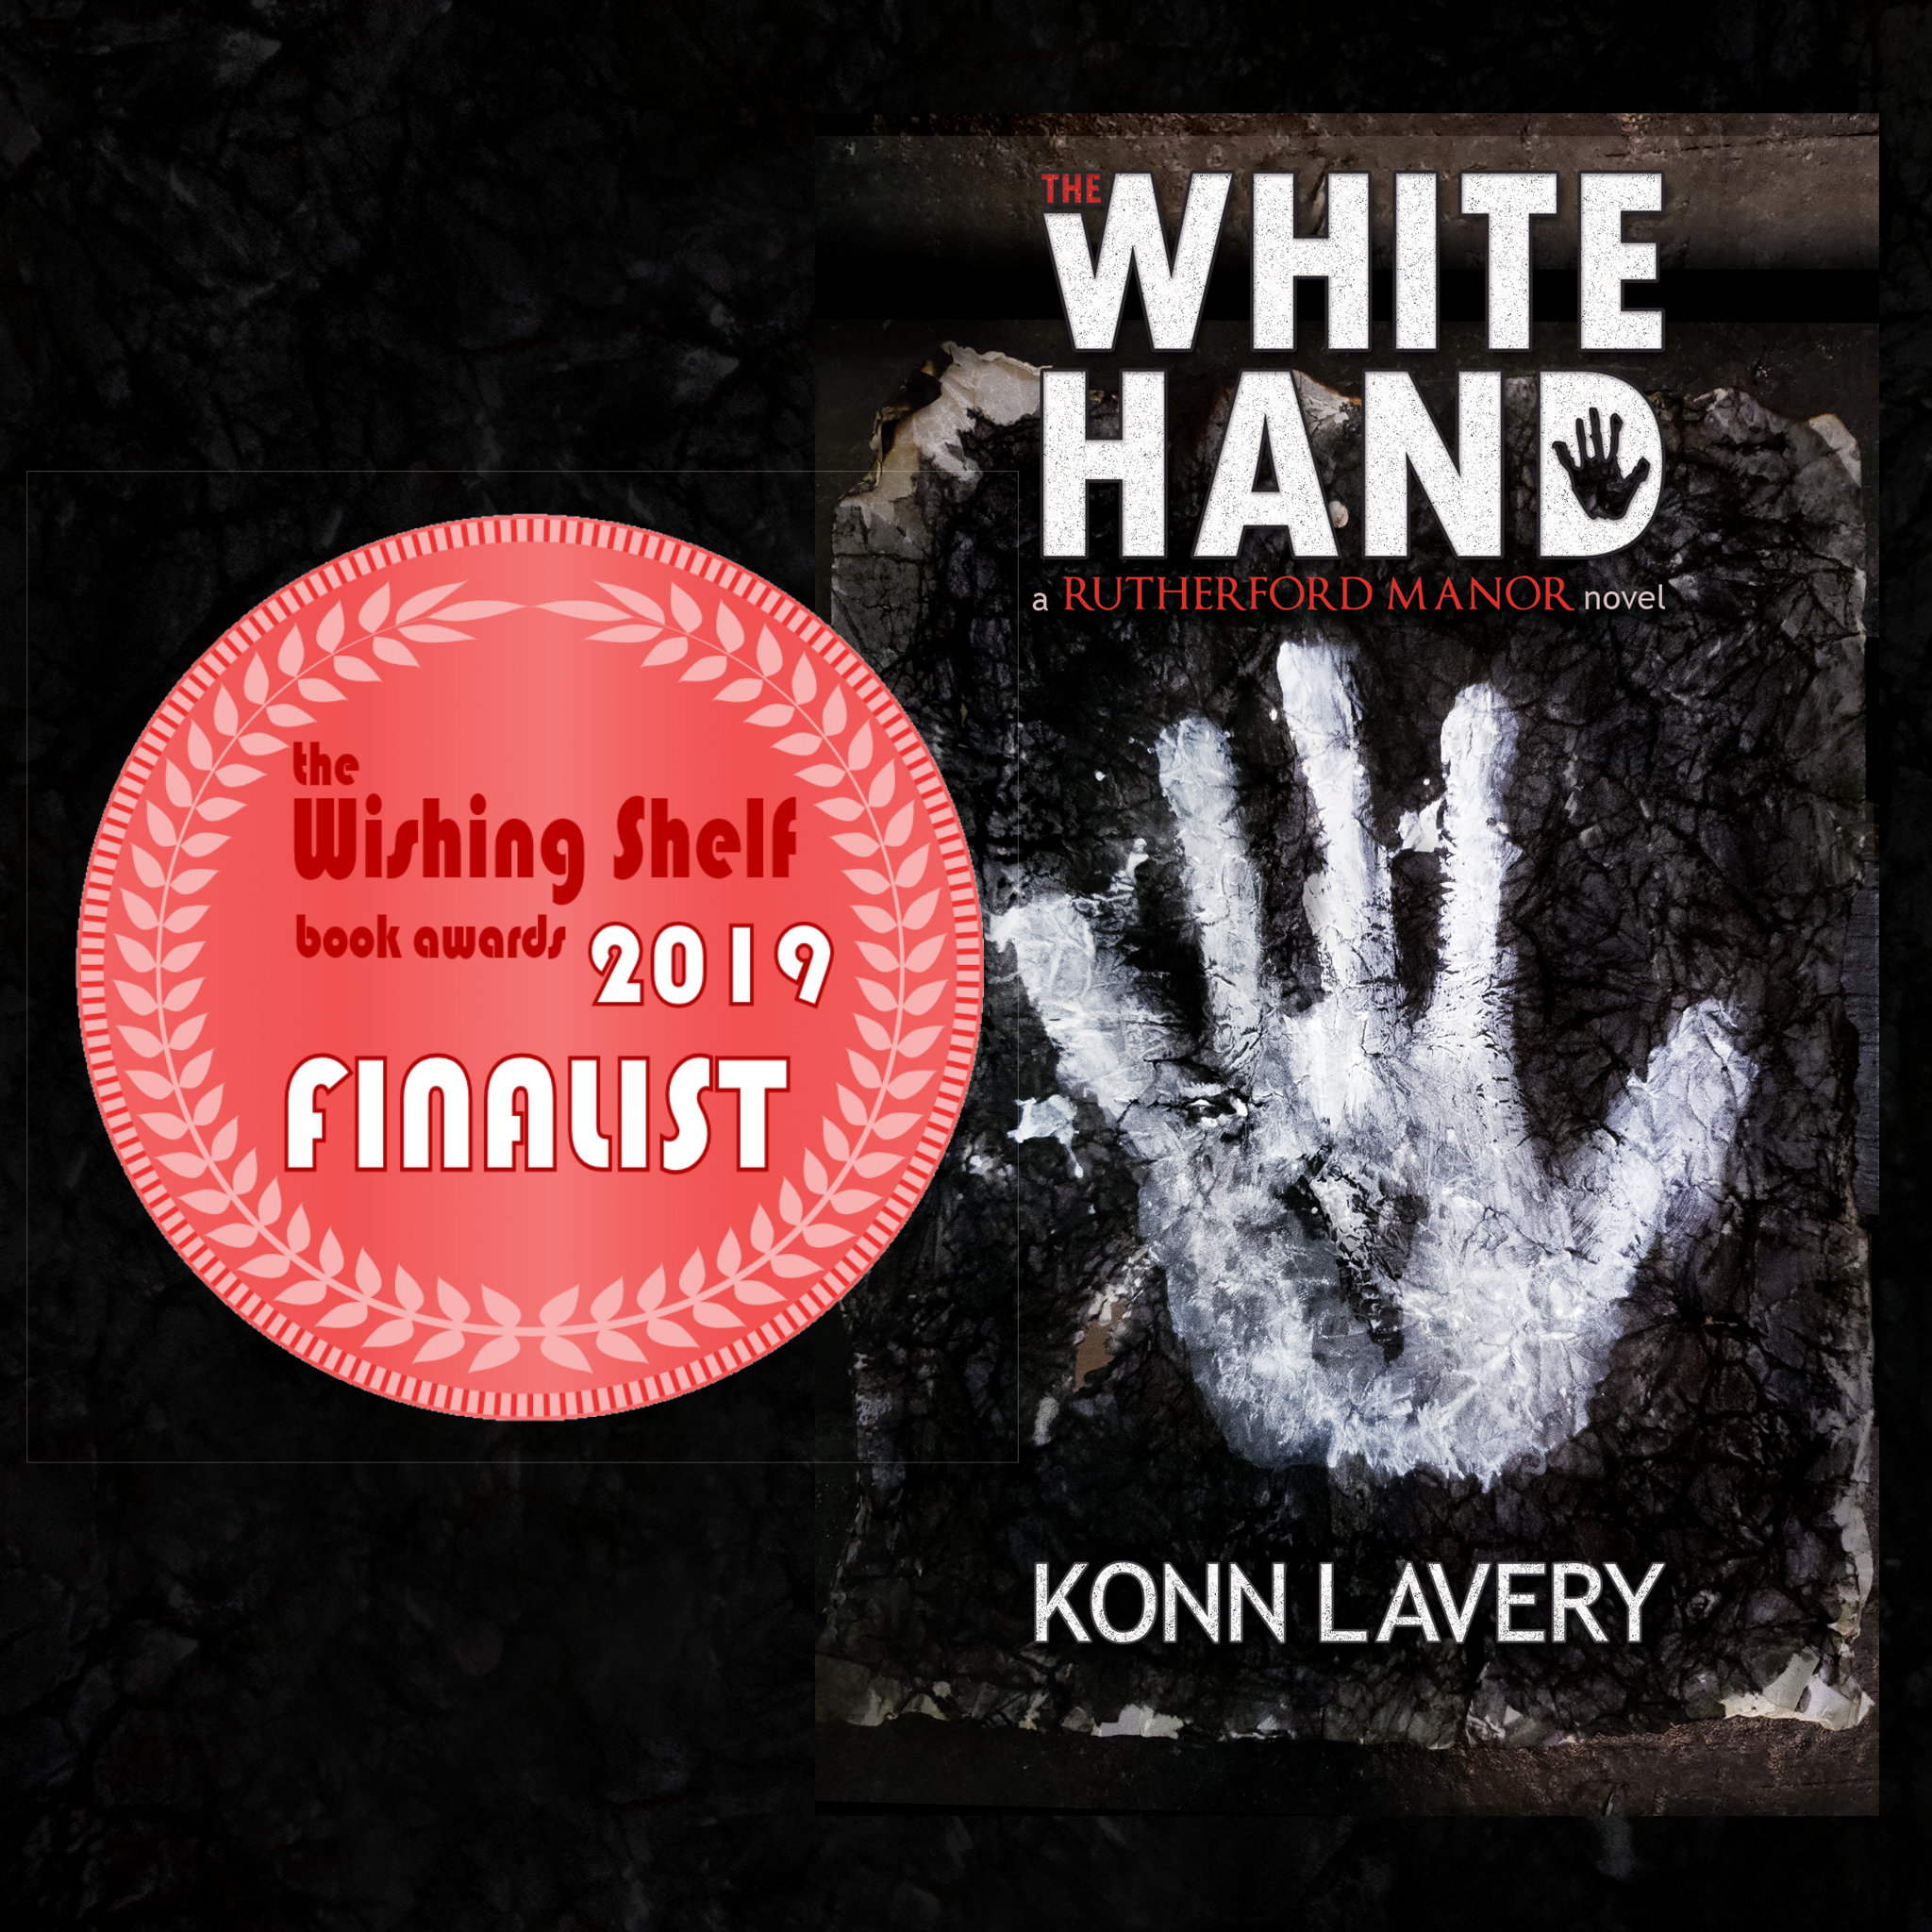 THE WISHING SHELF BOOK AWARDS 2019 FINALISTS/WINNERS - The White Hand by Konn Lavery